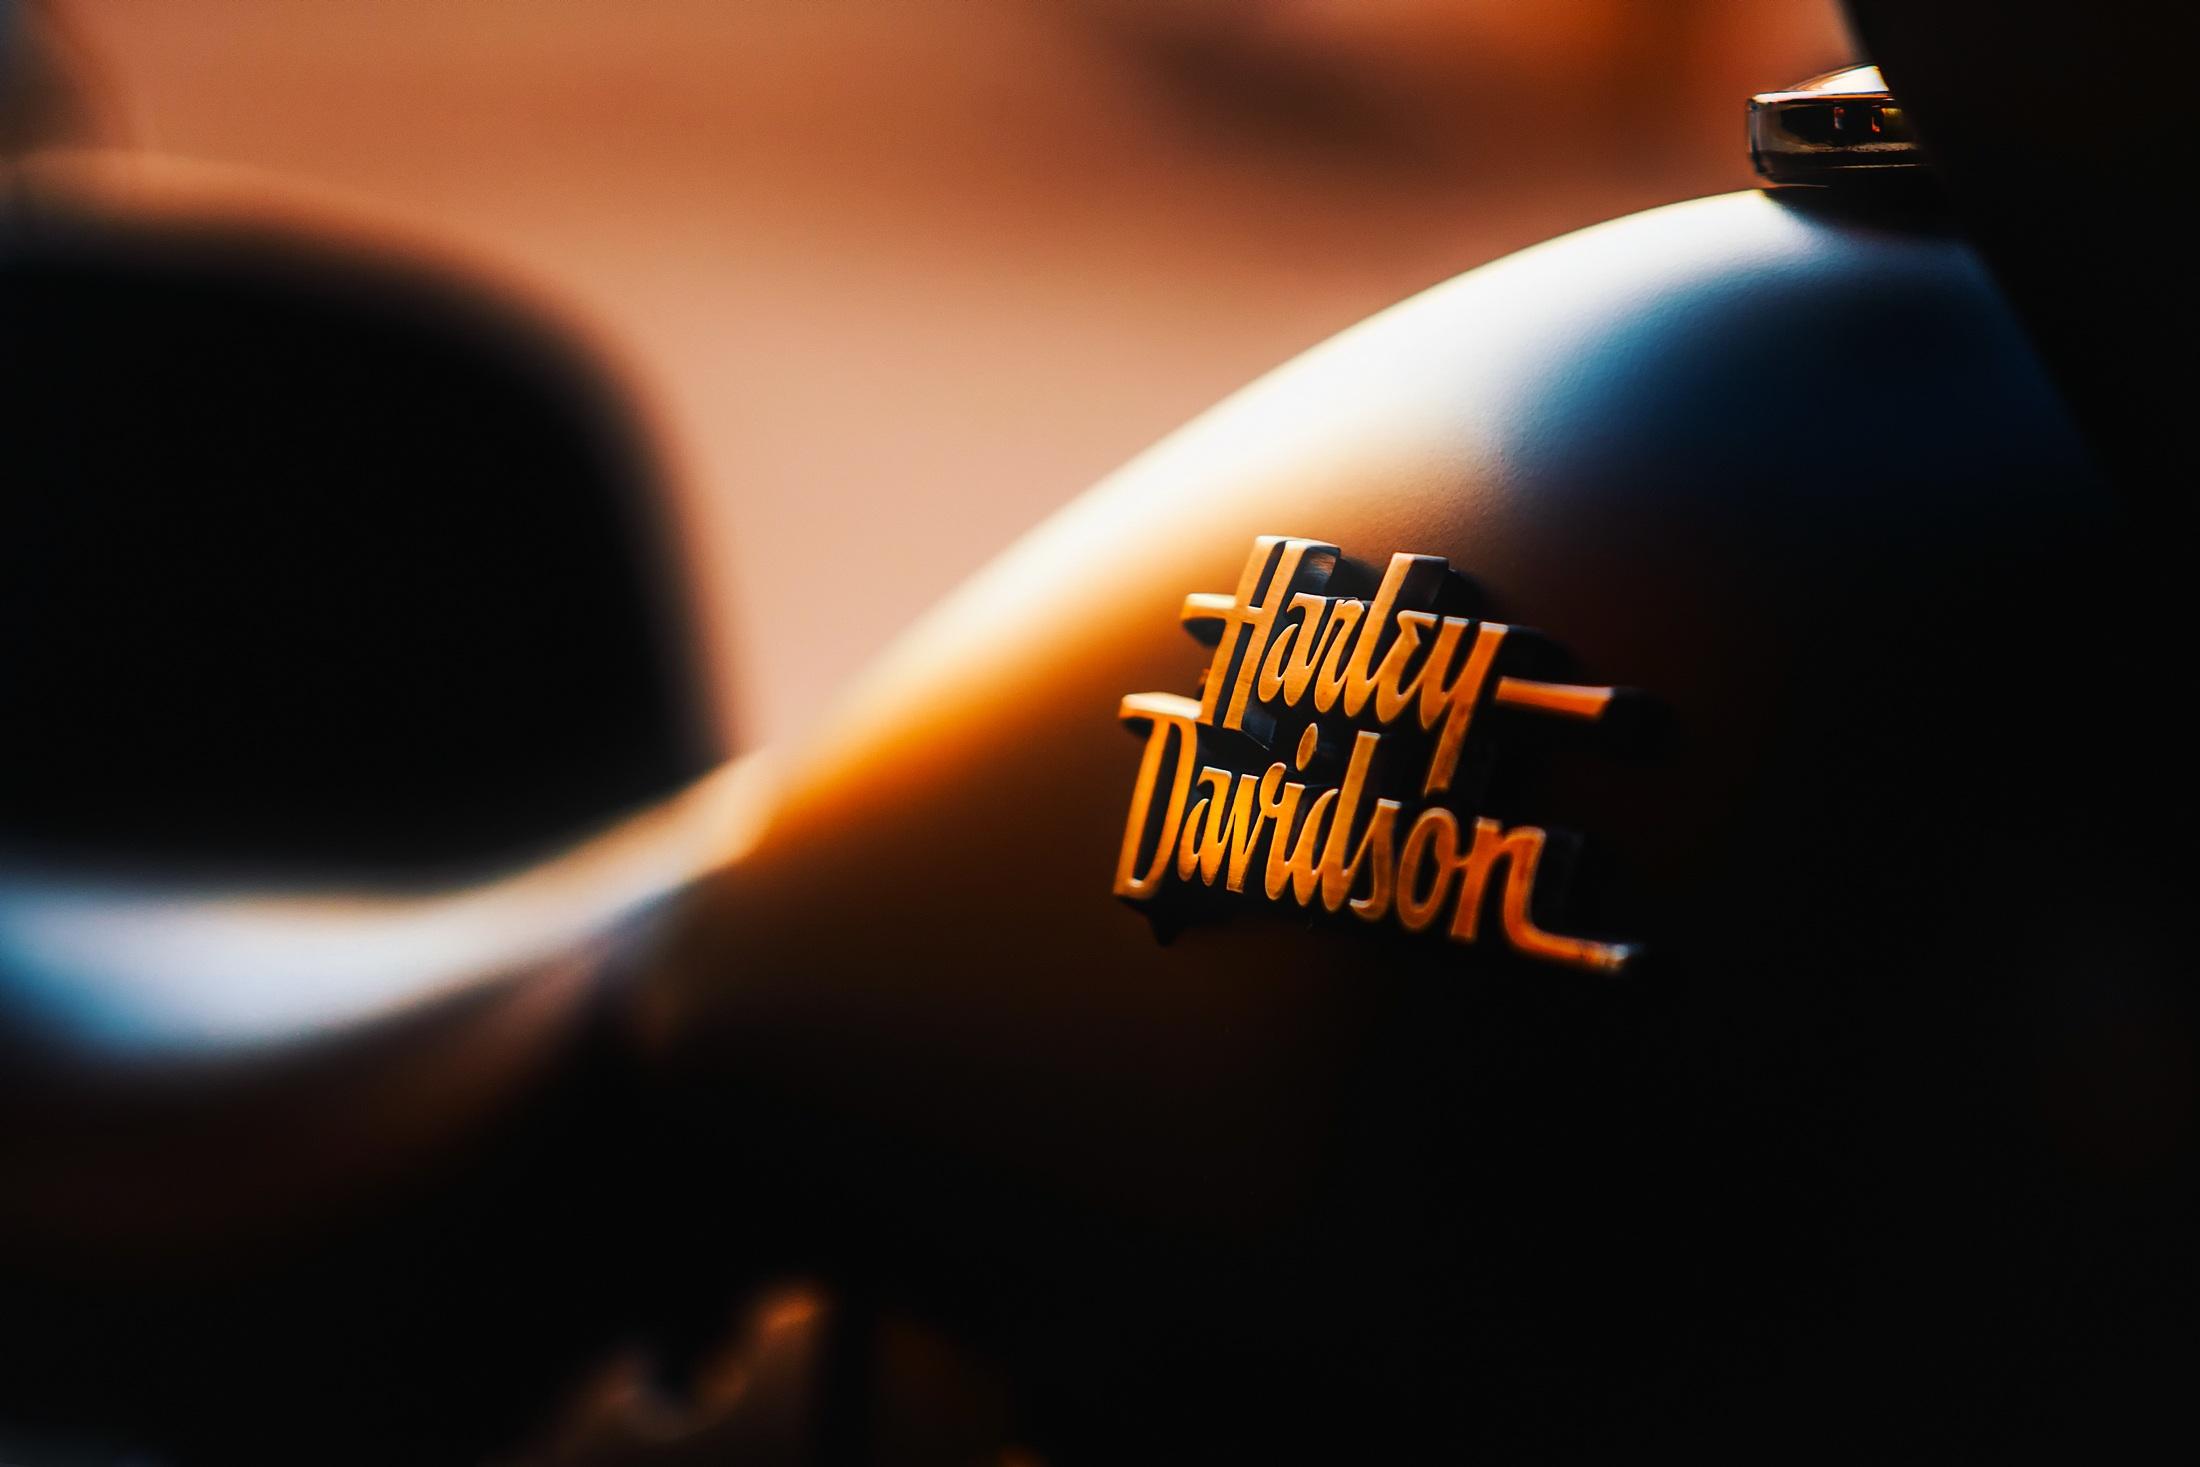 1080x1920 Harley Davidson Logo Bike Iphone 7 6s 6 Plus Pixel Xl